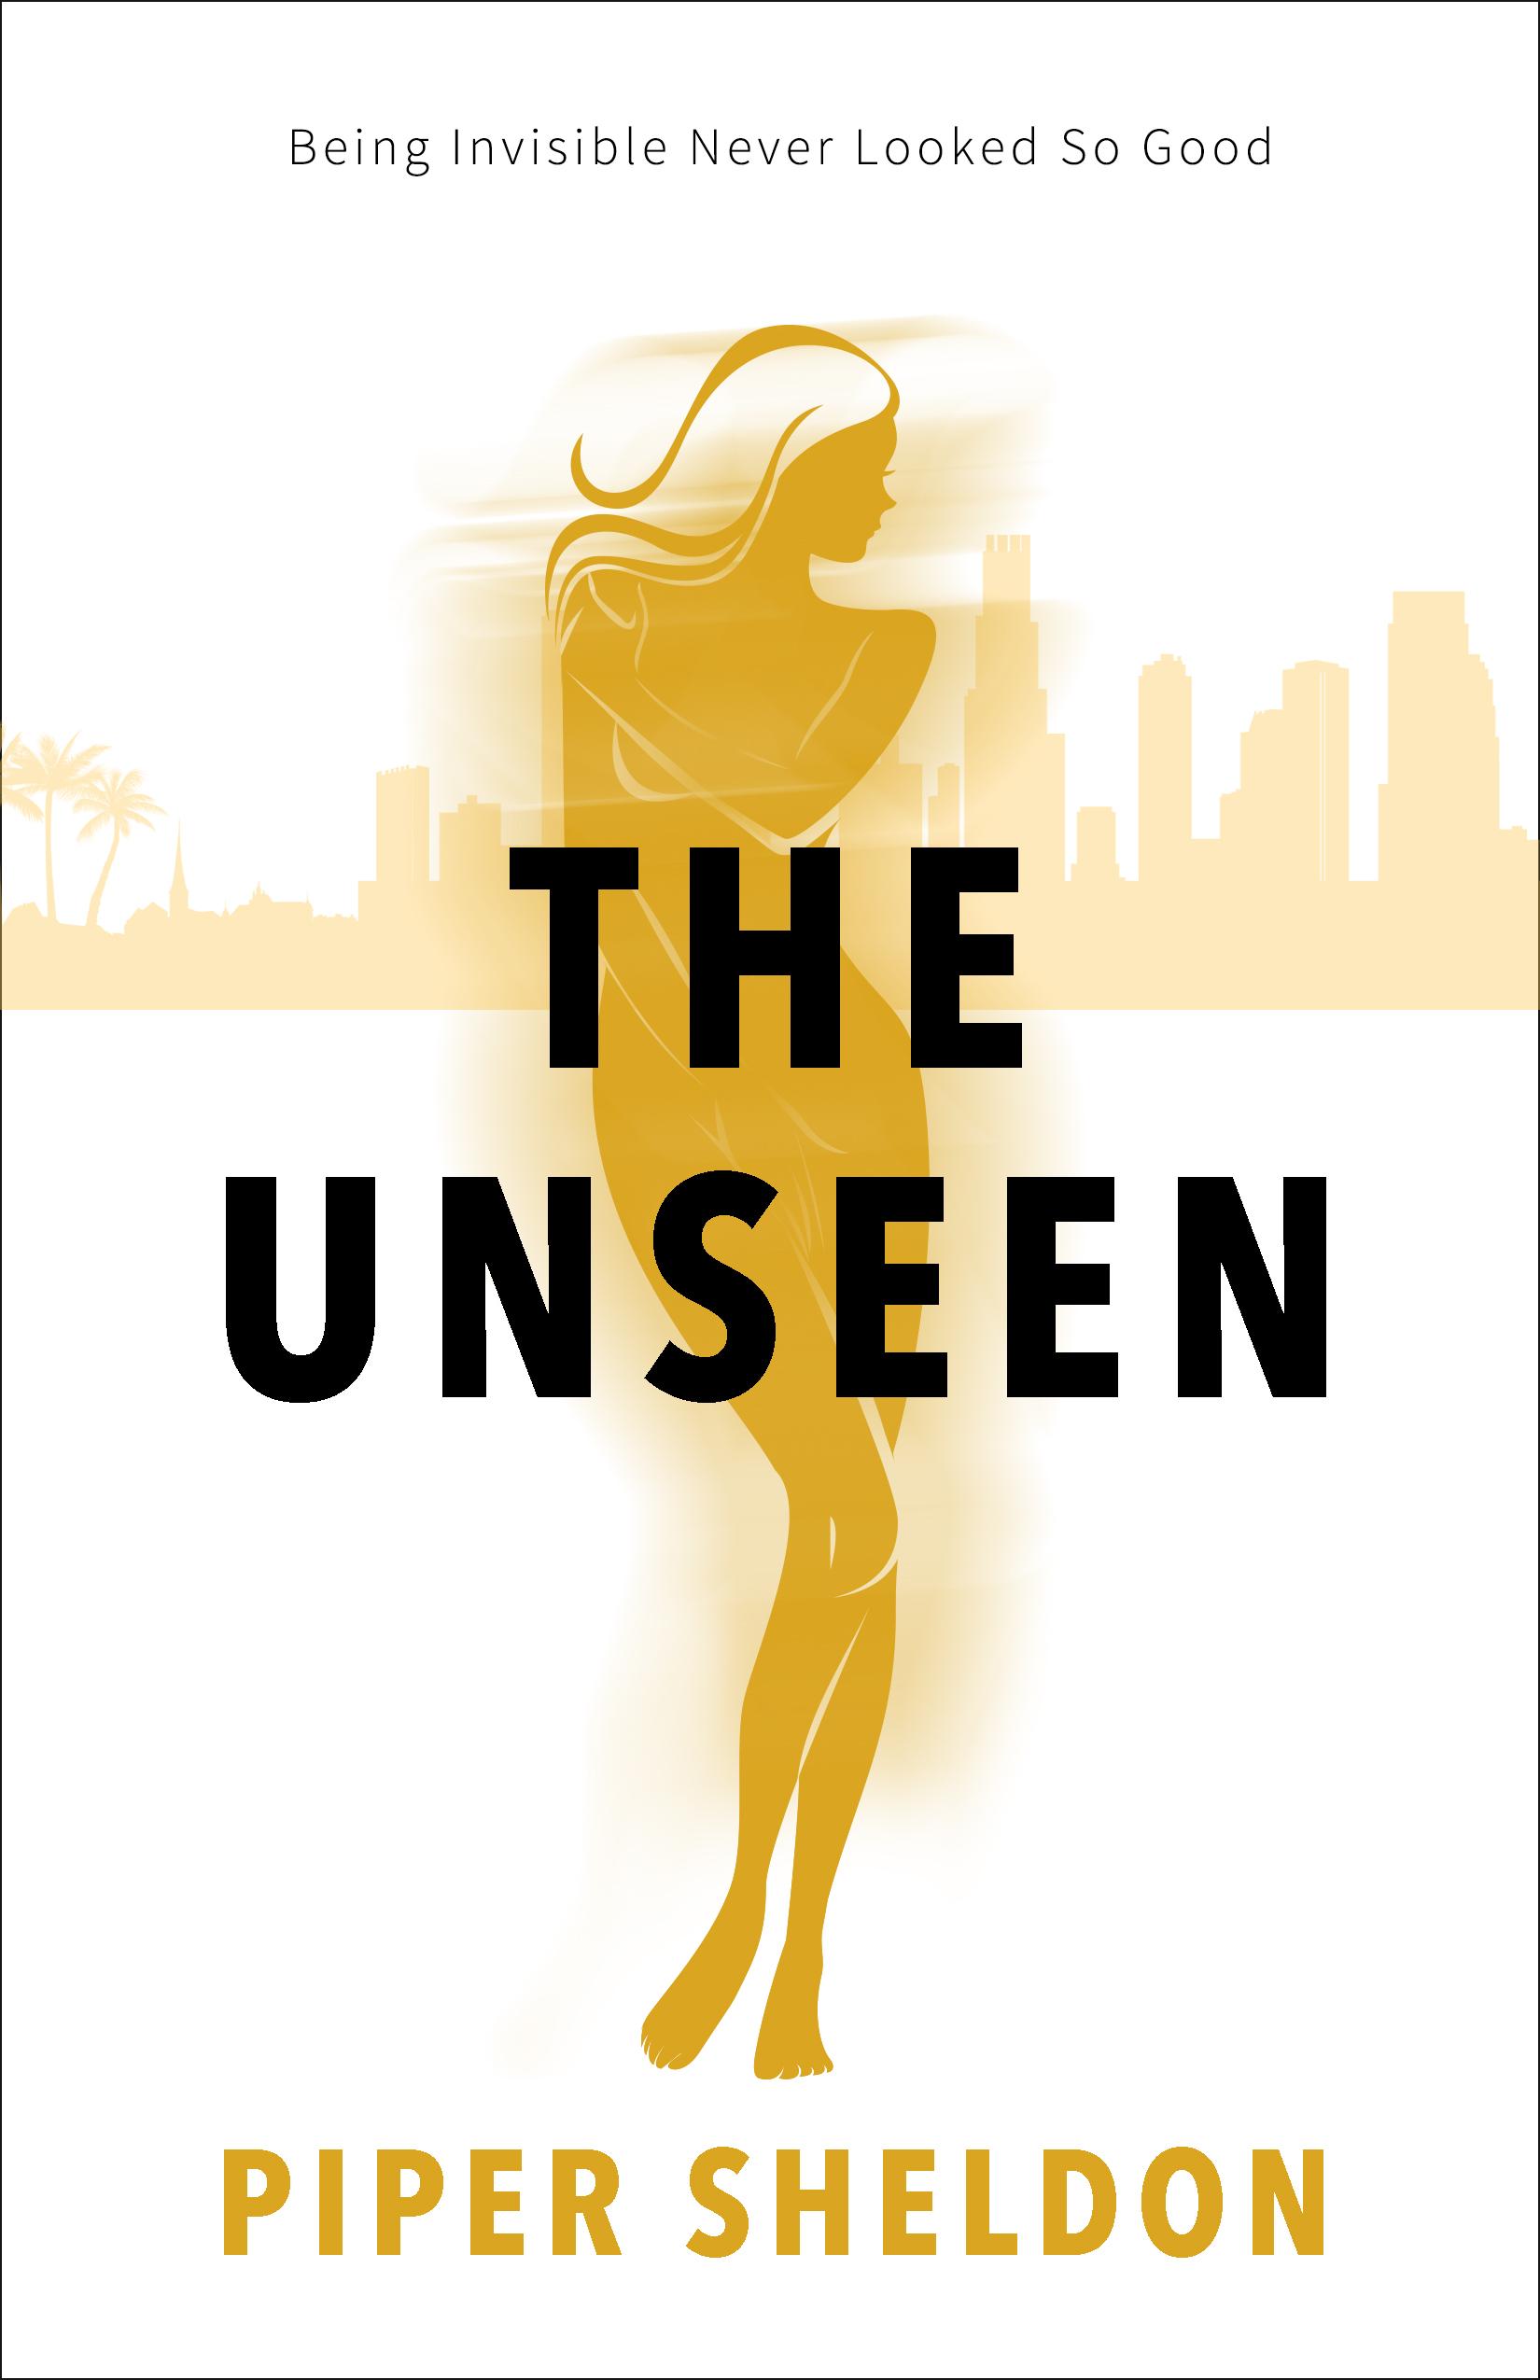 The_Unseen_PSheldon_stroke (2)